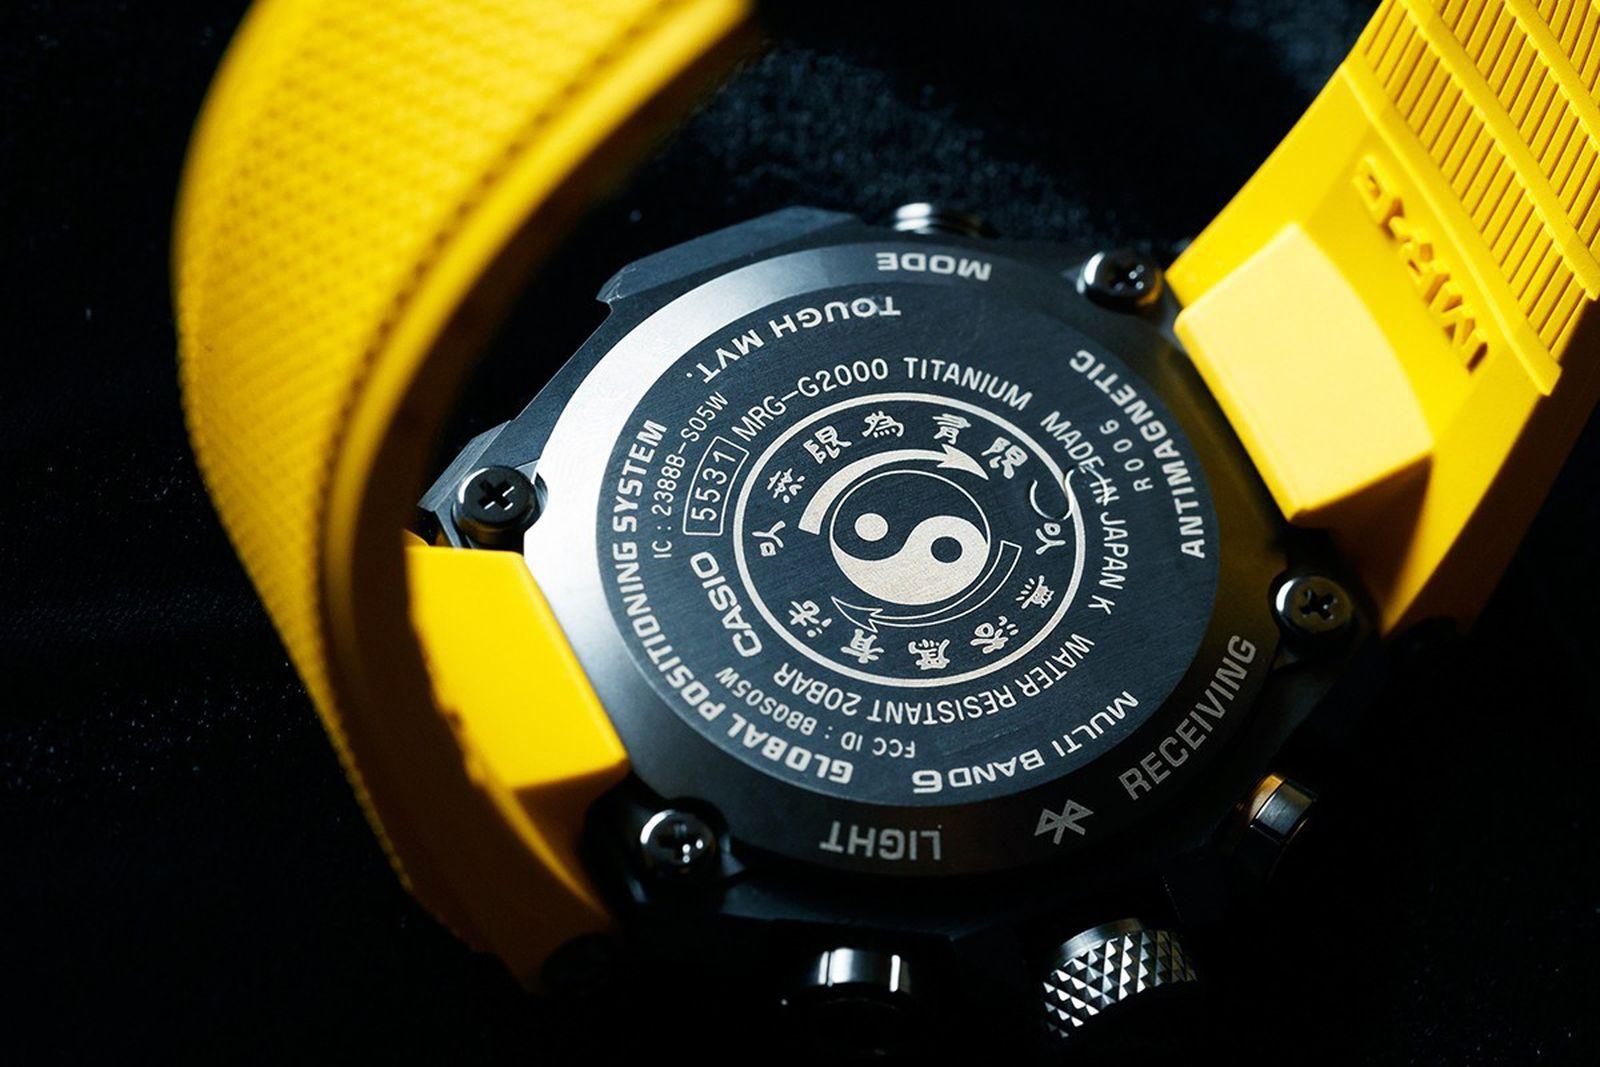 Bruce Lee G-SHOCK Watch